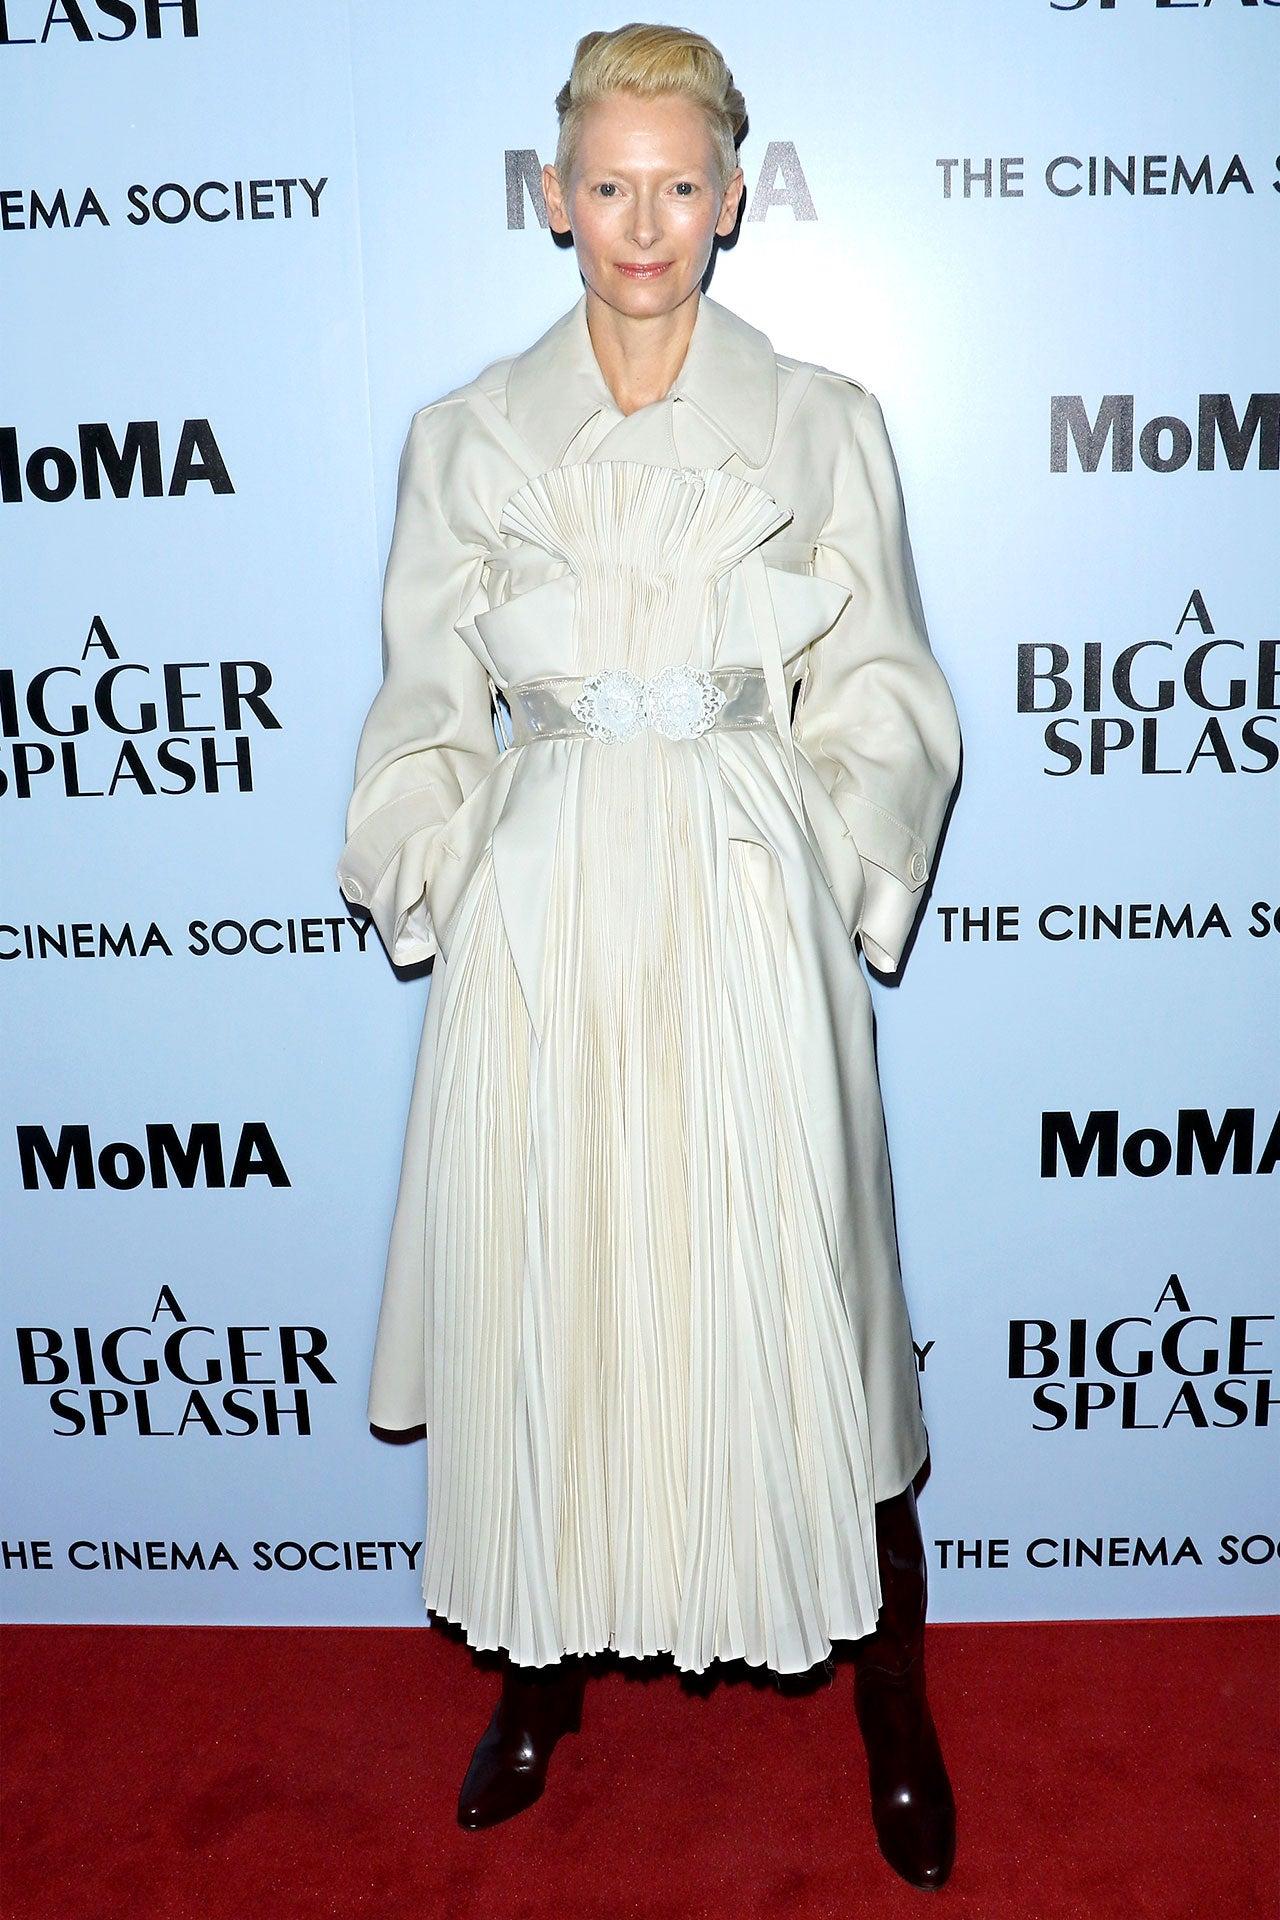 Tilda Swinton na premiéře filmu A Bigger Splash, duben 2016    Autor: Jim Spellman/WireImage